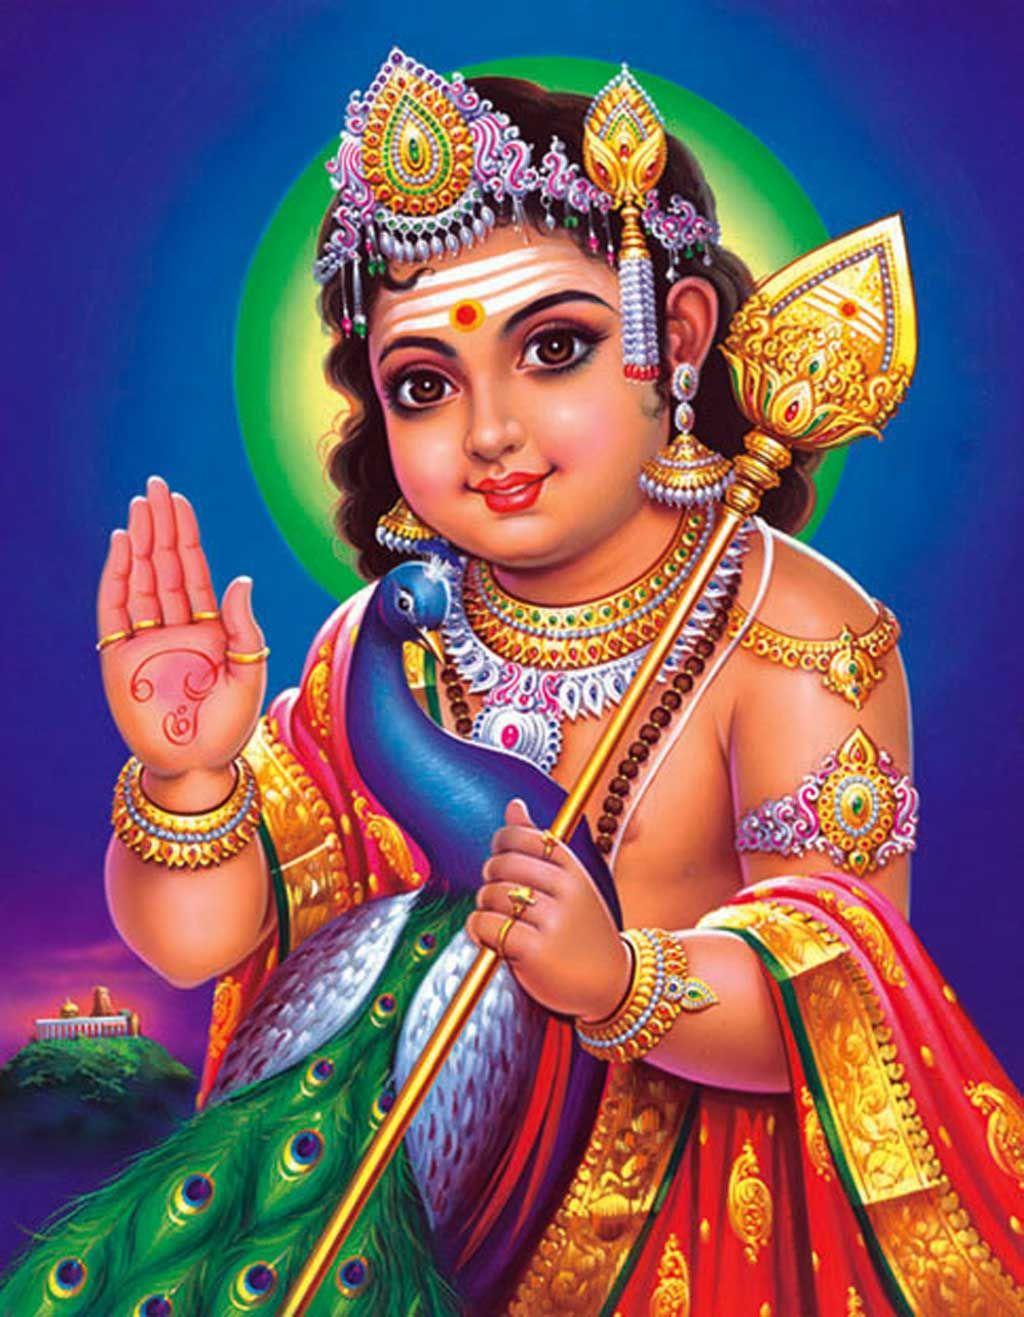 Full Hd God Murugan Hd Image Free Download Wallpapers Android In 2021 Lord Murugan Wallpapers Lord Murugan Lord Shiva Family